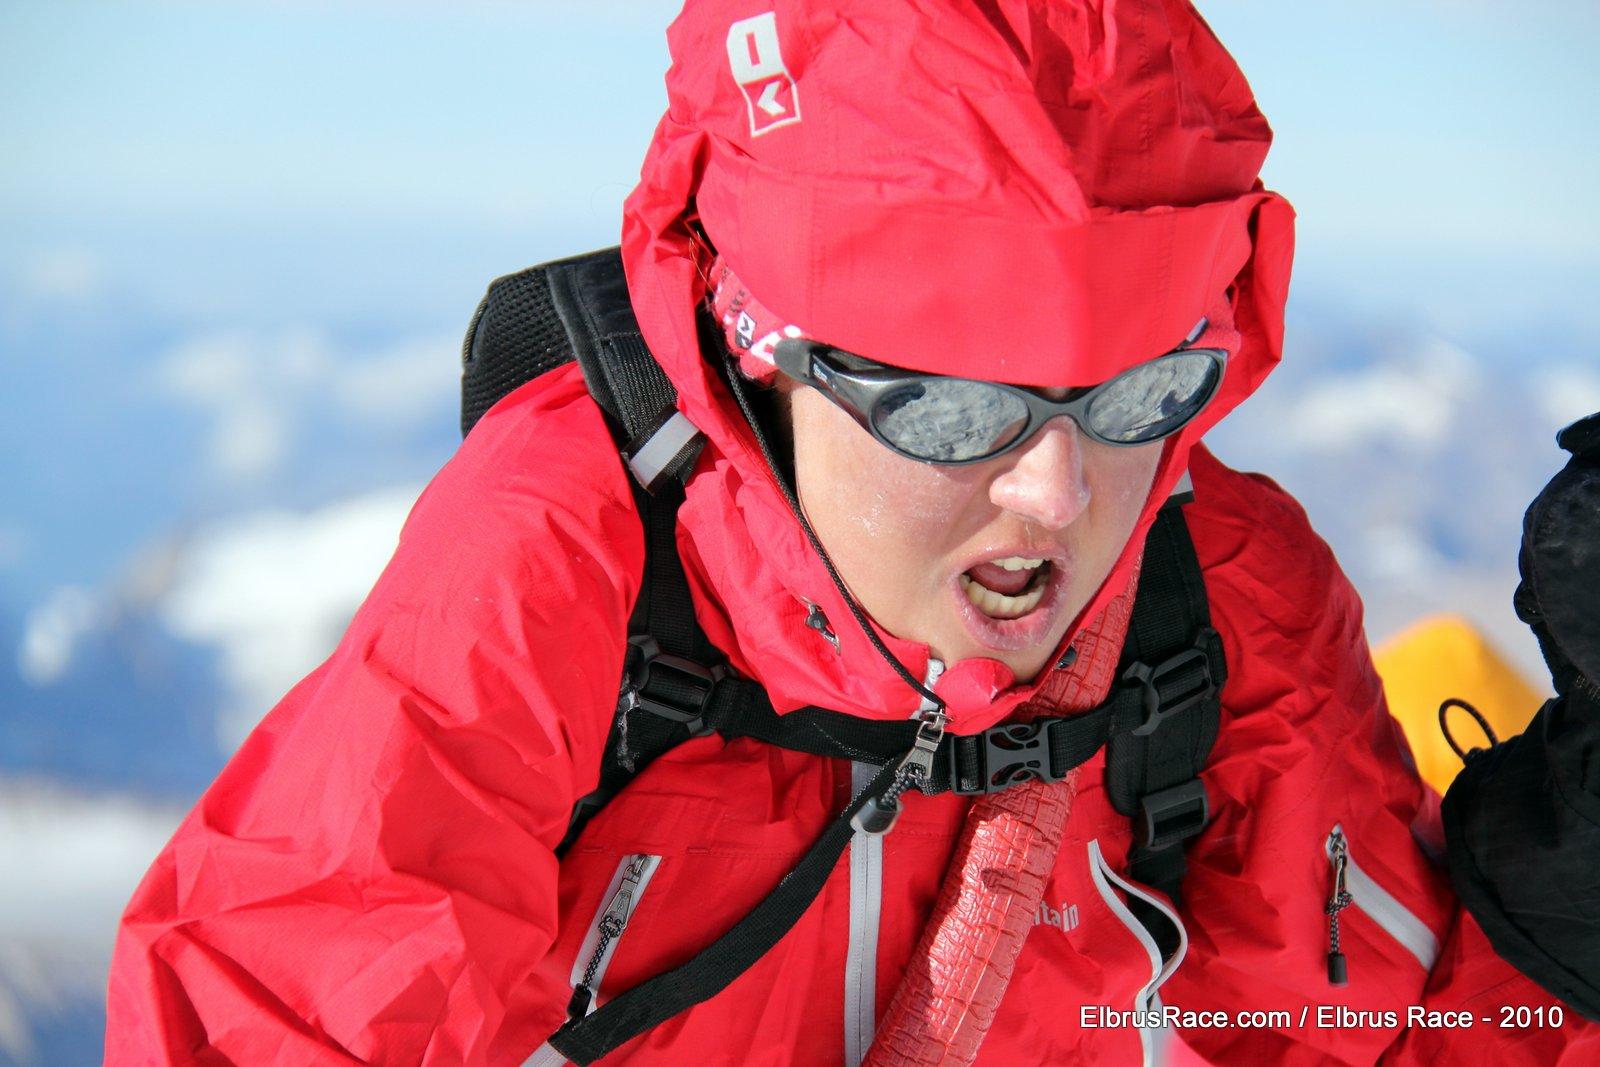 elbrus-race-2010  -  Александра Джик